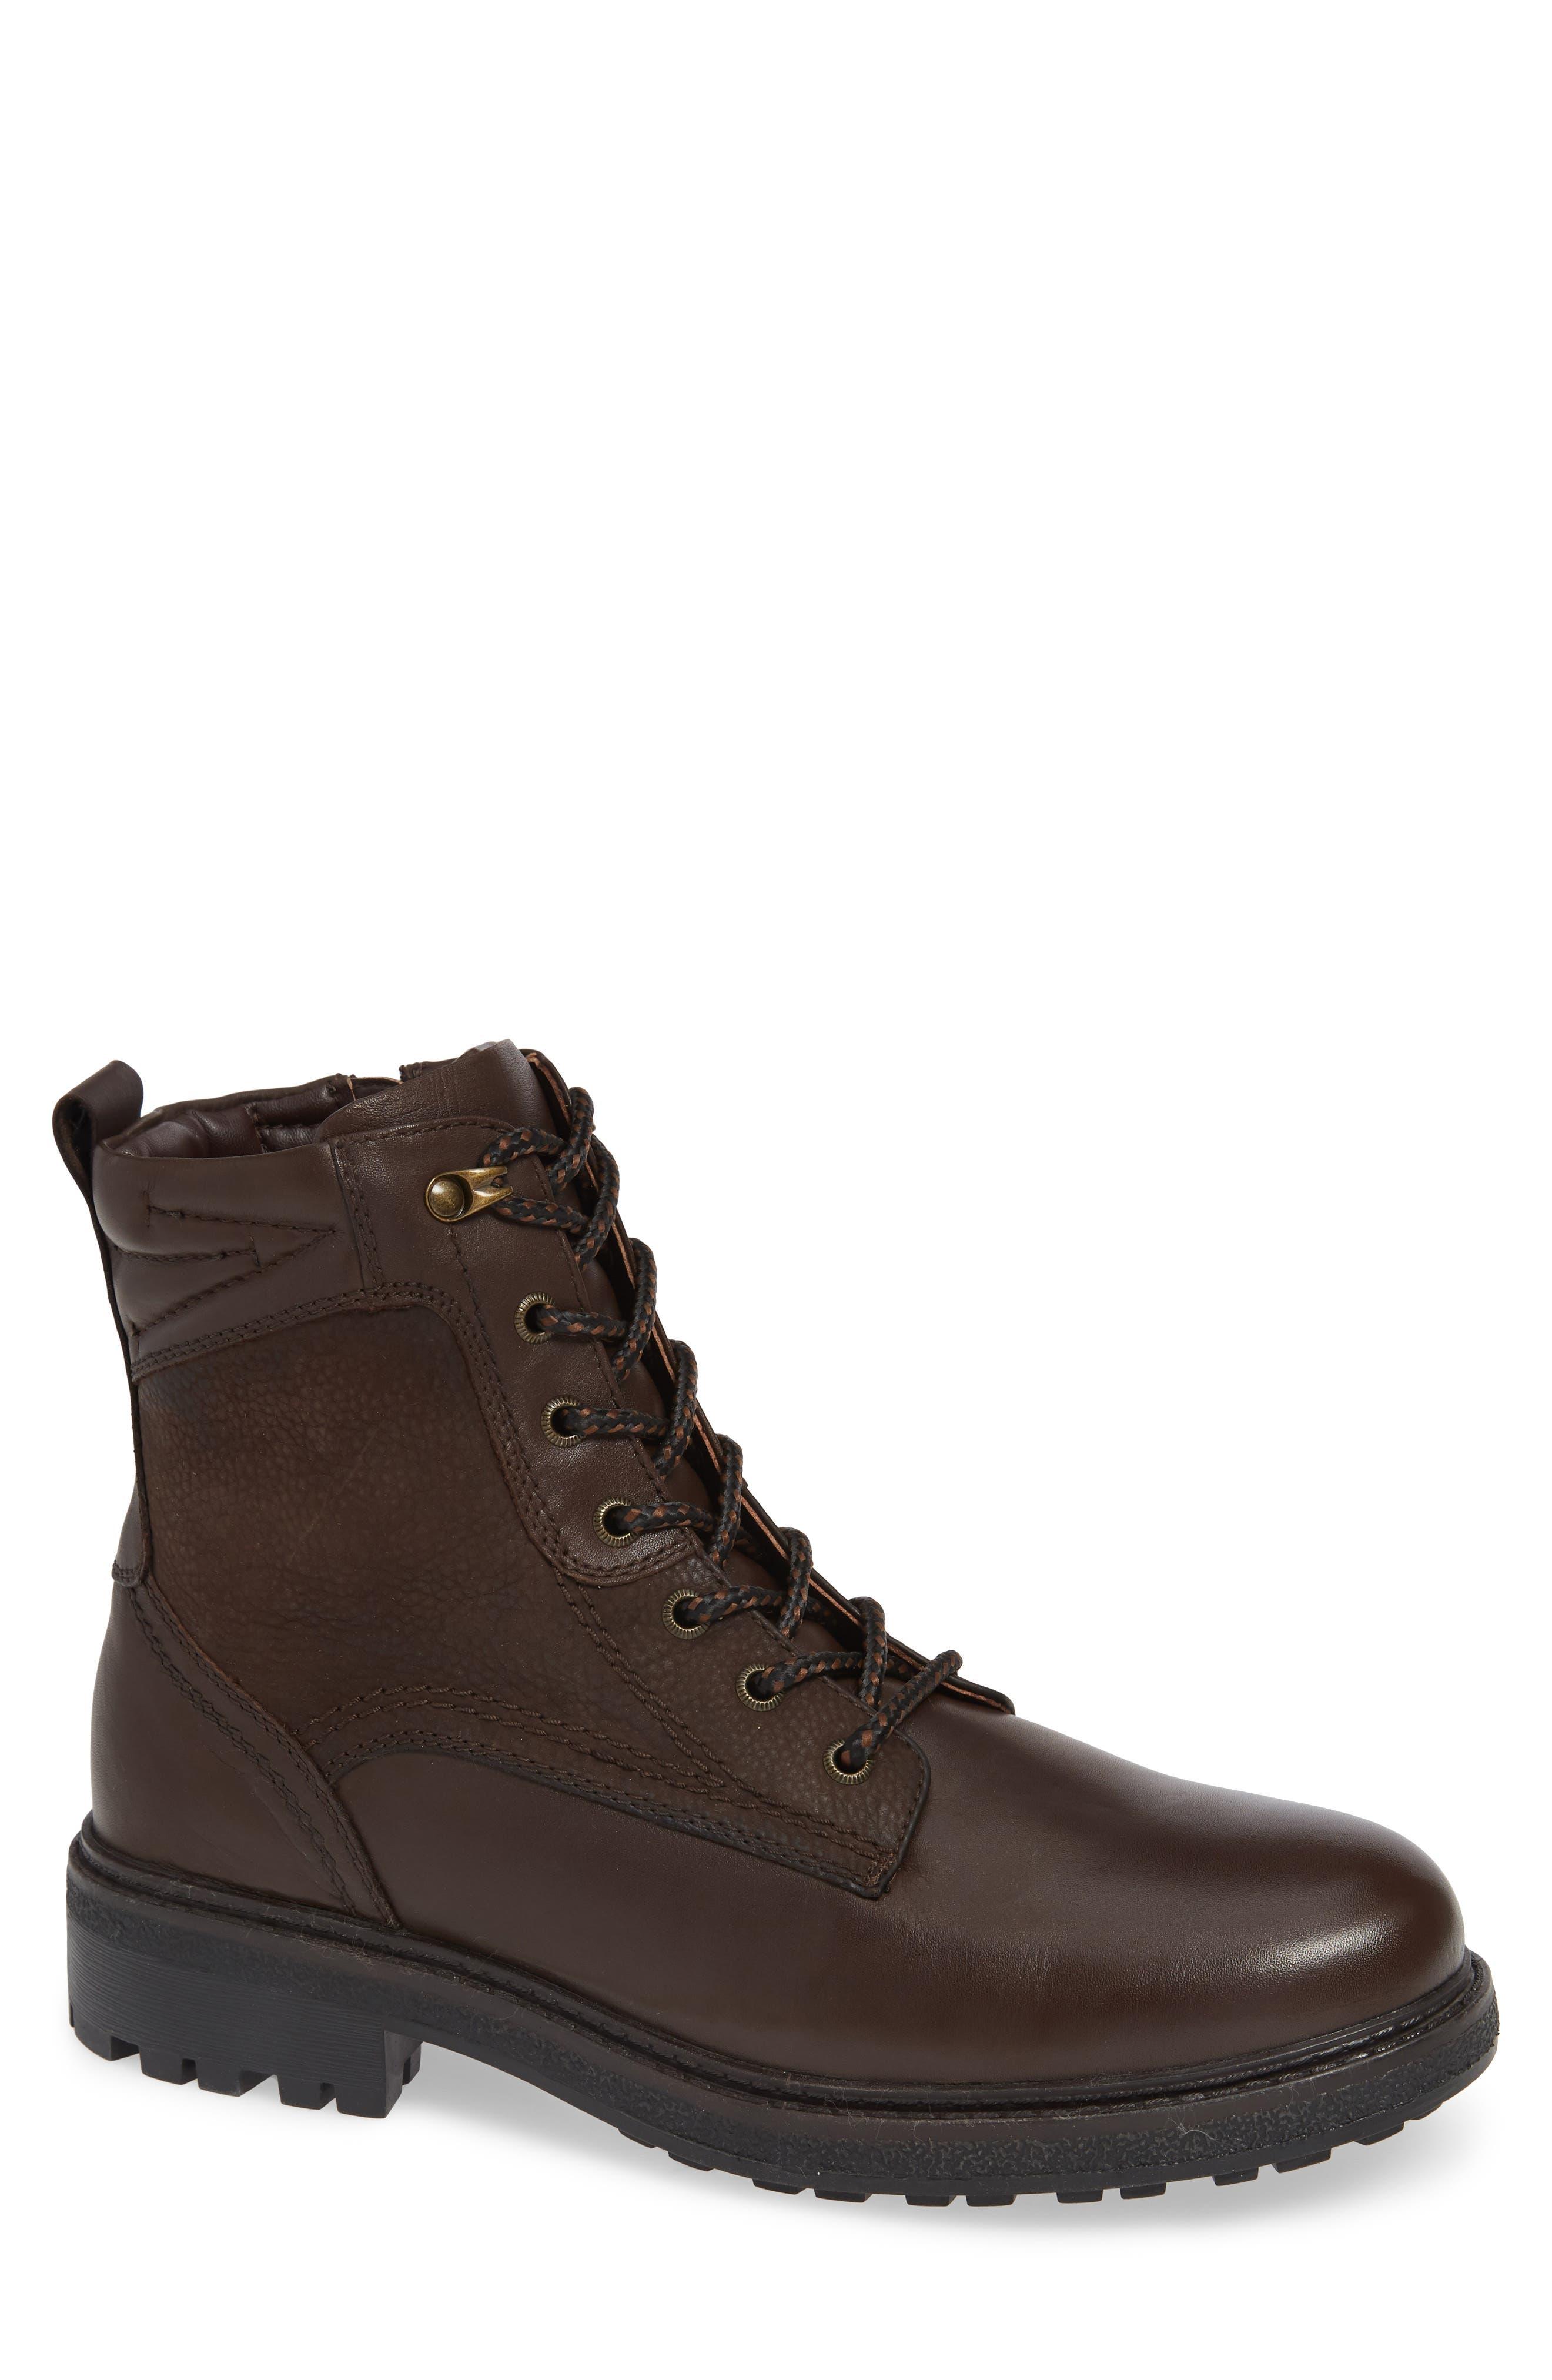 BLONDO Jasper Waterproof Plain Toe Boot, Main, color, BROWN LEATHER